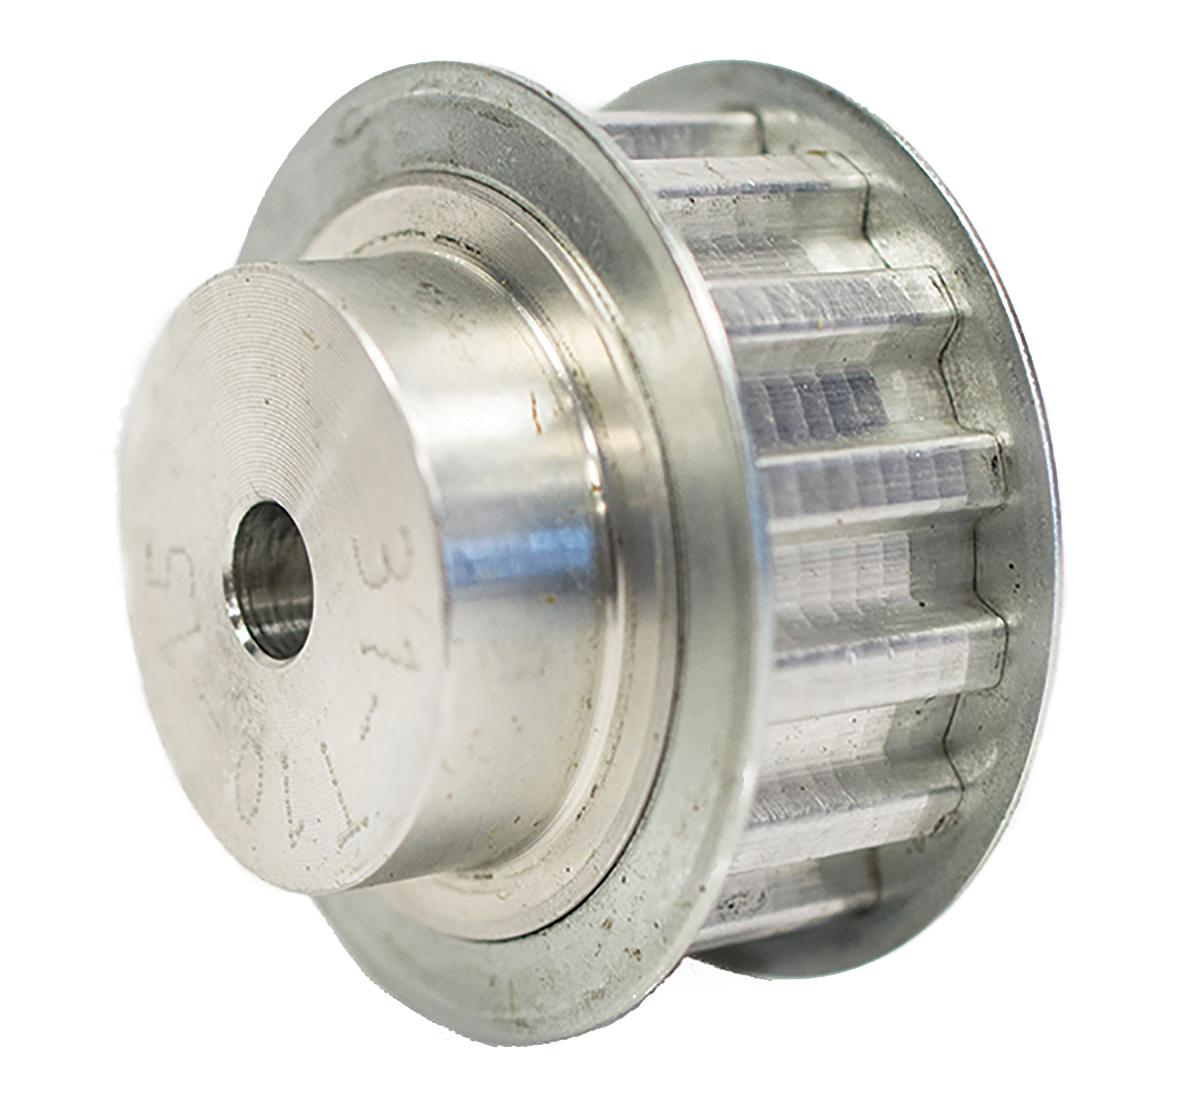 31T10/15-2 - Aluminum Metric Pulleys